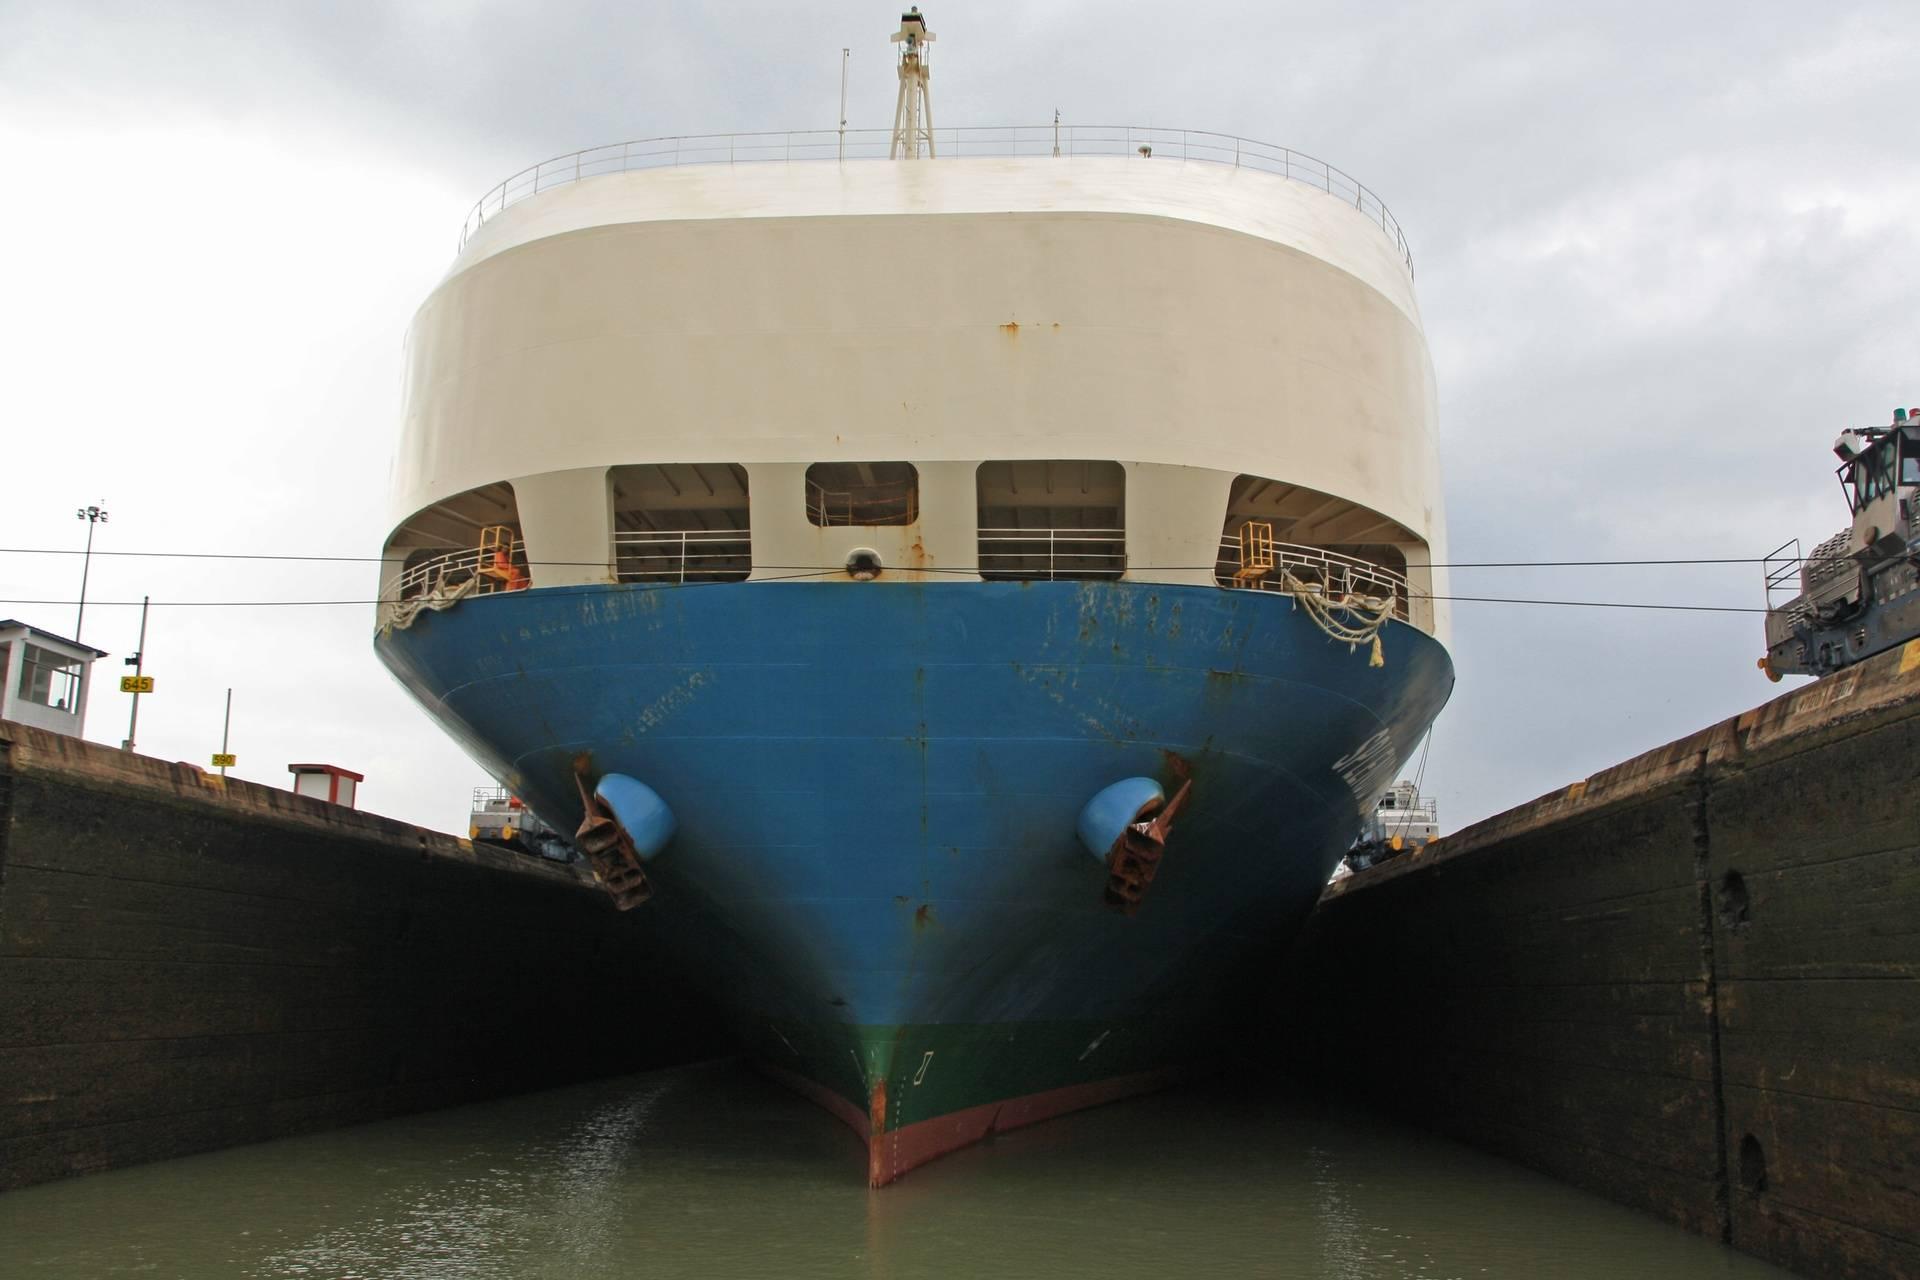 Panama Canal Cruise - ship in locks